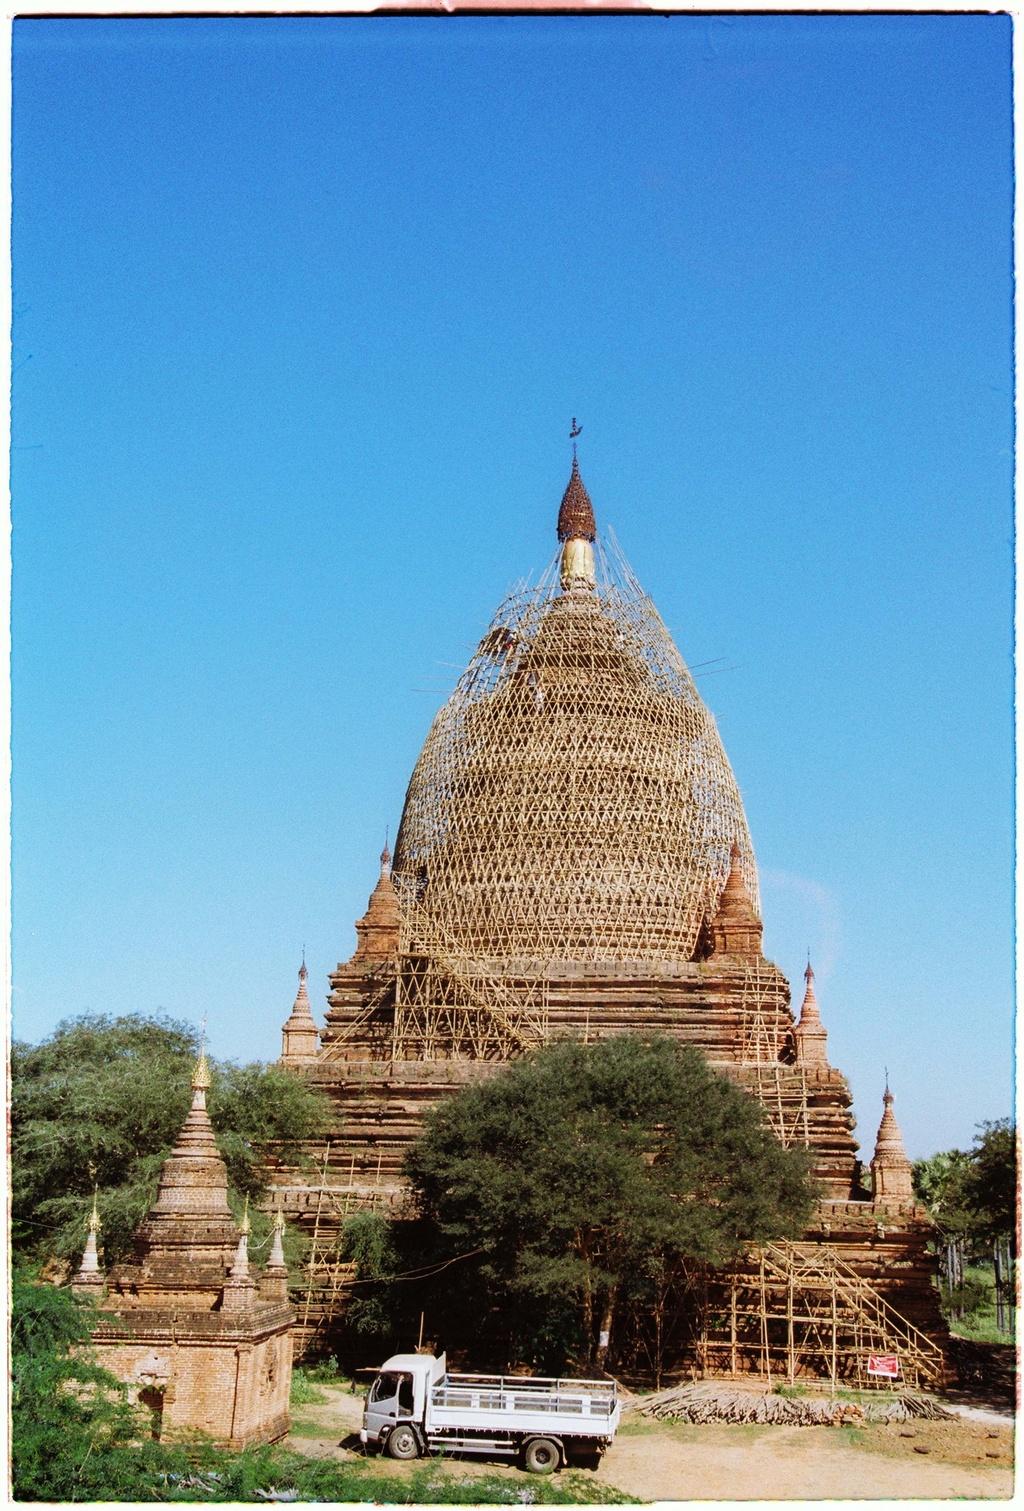 Bagan - thien duong cua mat troi hinh anh 11